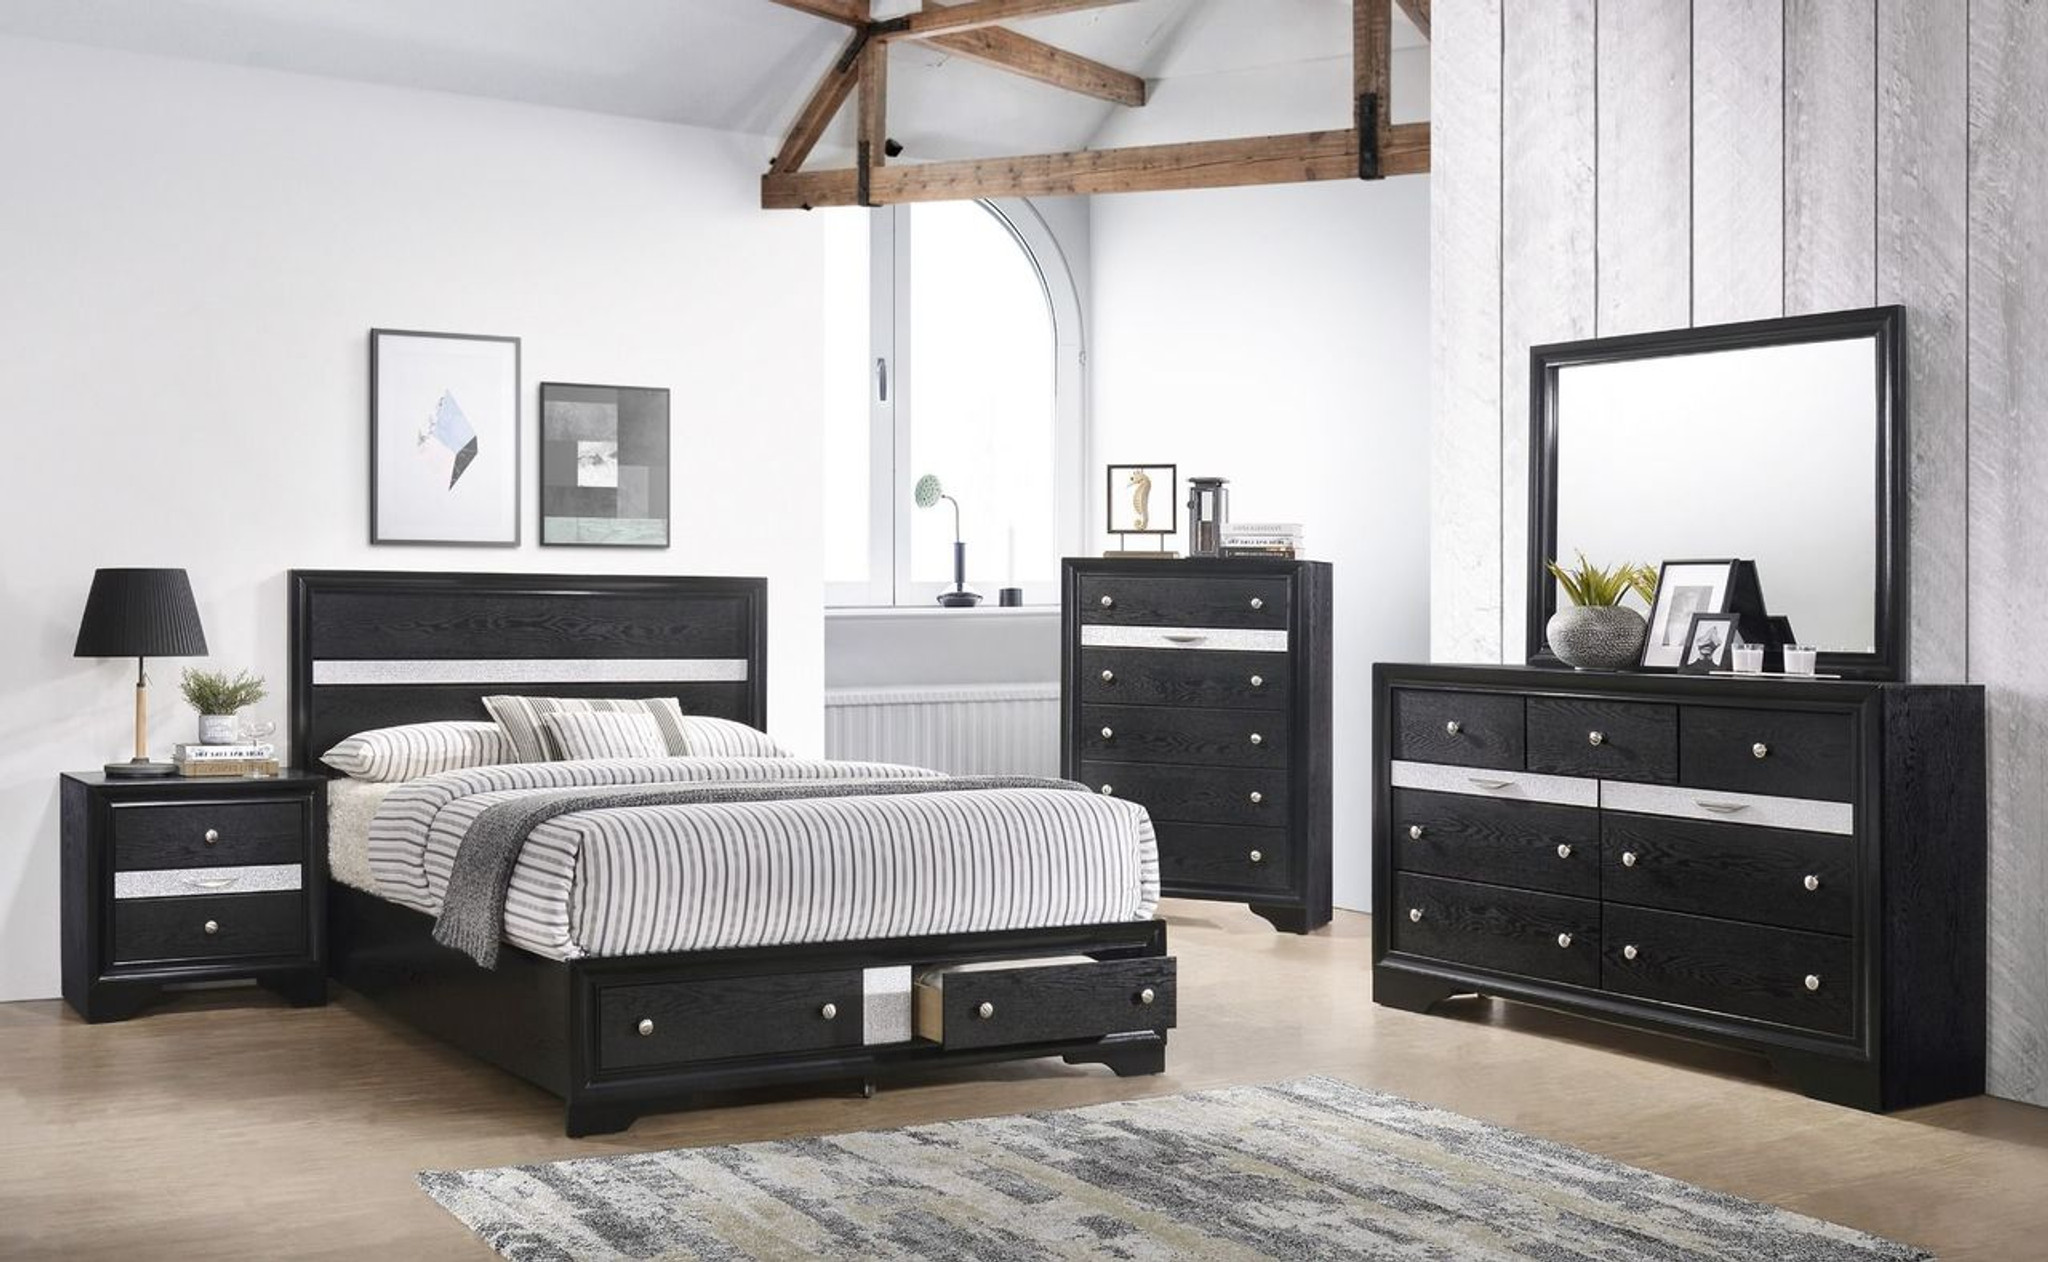 B4670 6 Pcs 6 Regata Black Platform Bedroom Set By Crown Mark